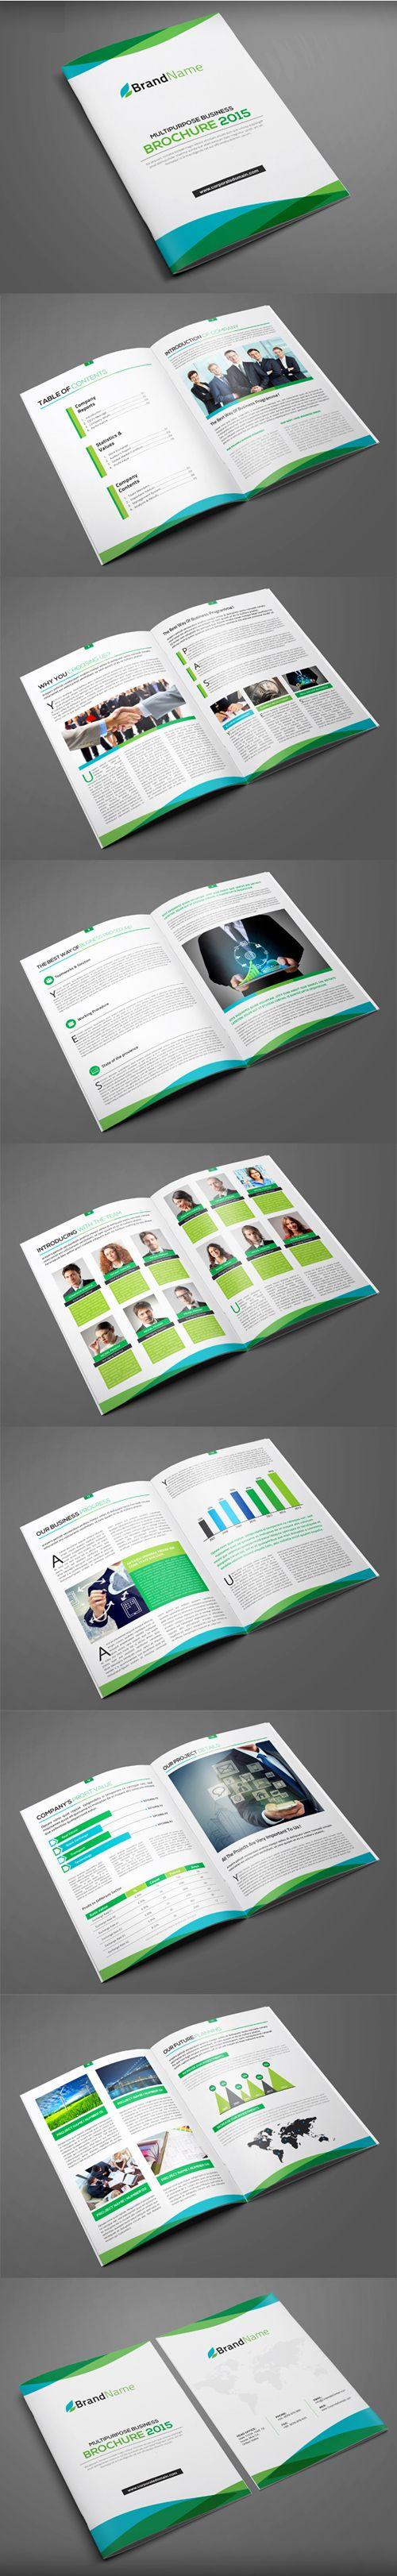 Multipurpose Brochure Design #booklet #brochuredesign #brochuretemplates #catalogdesign